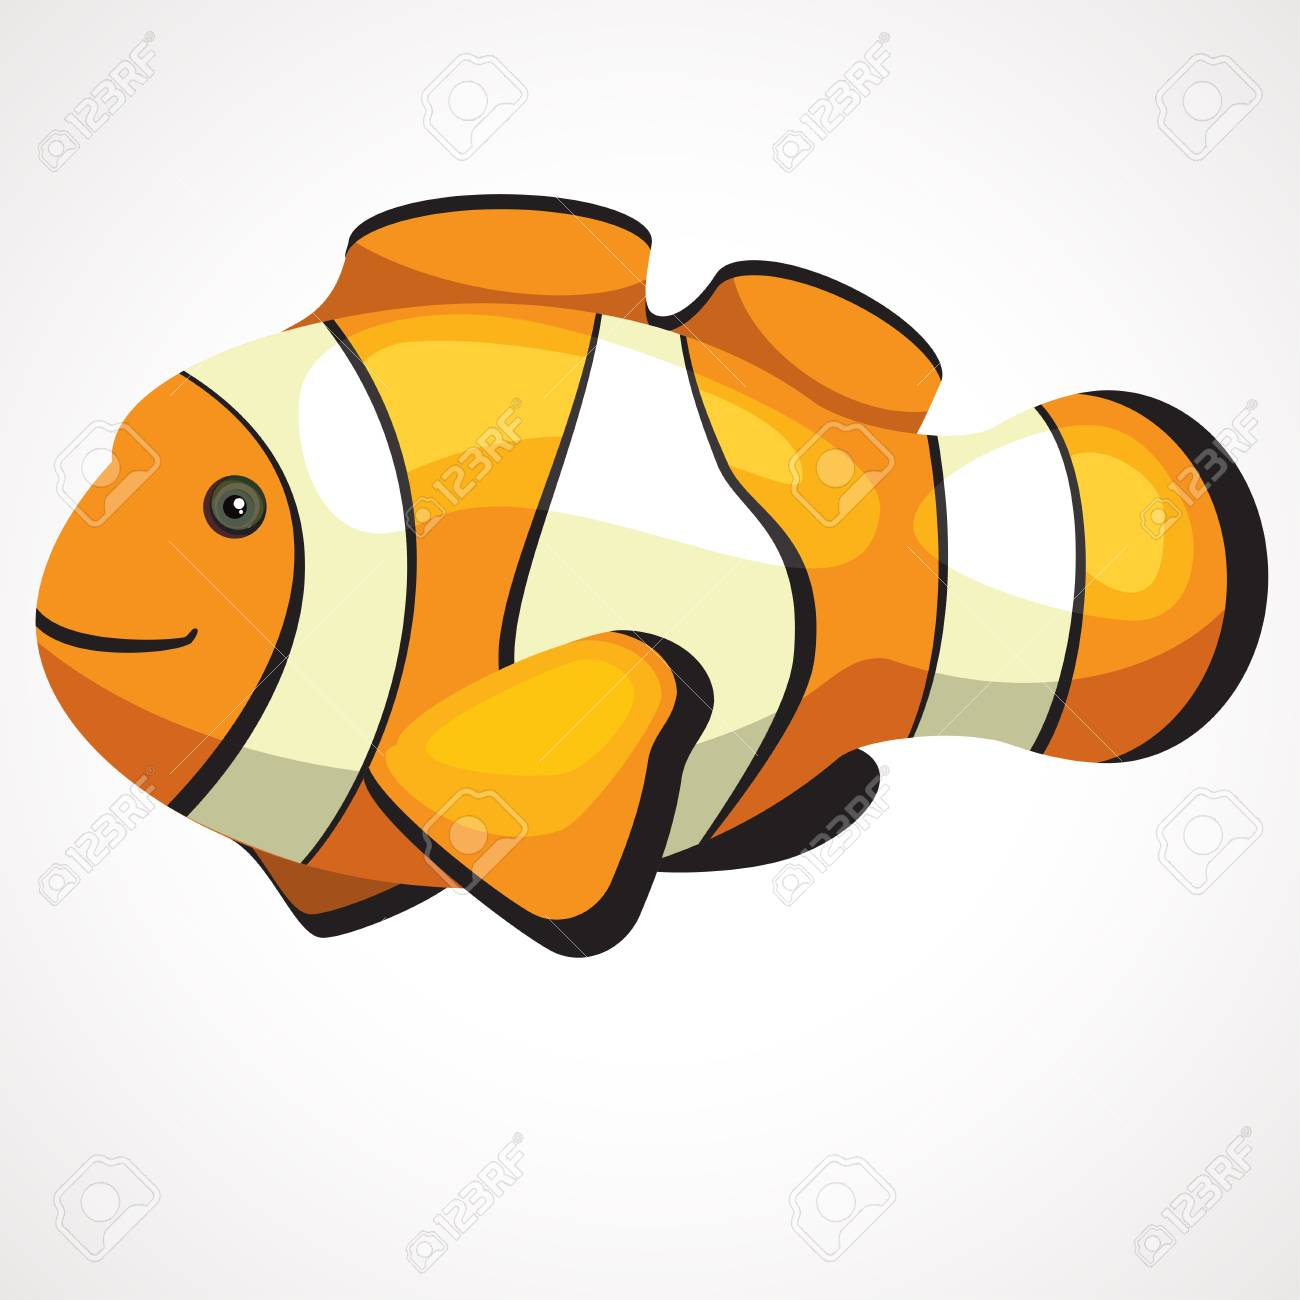 Gold Aquarium Cute Clown Fish Cartoon Vector Drawing Royalty Free Cliparts Vectors And Stock Illustration Image 110245784